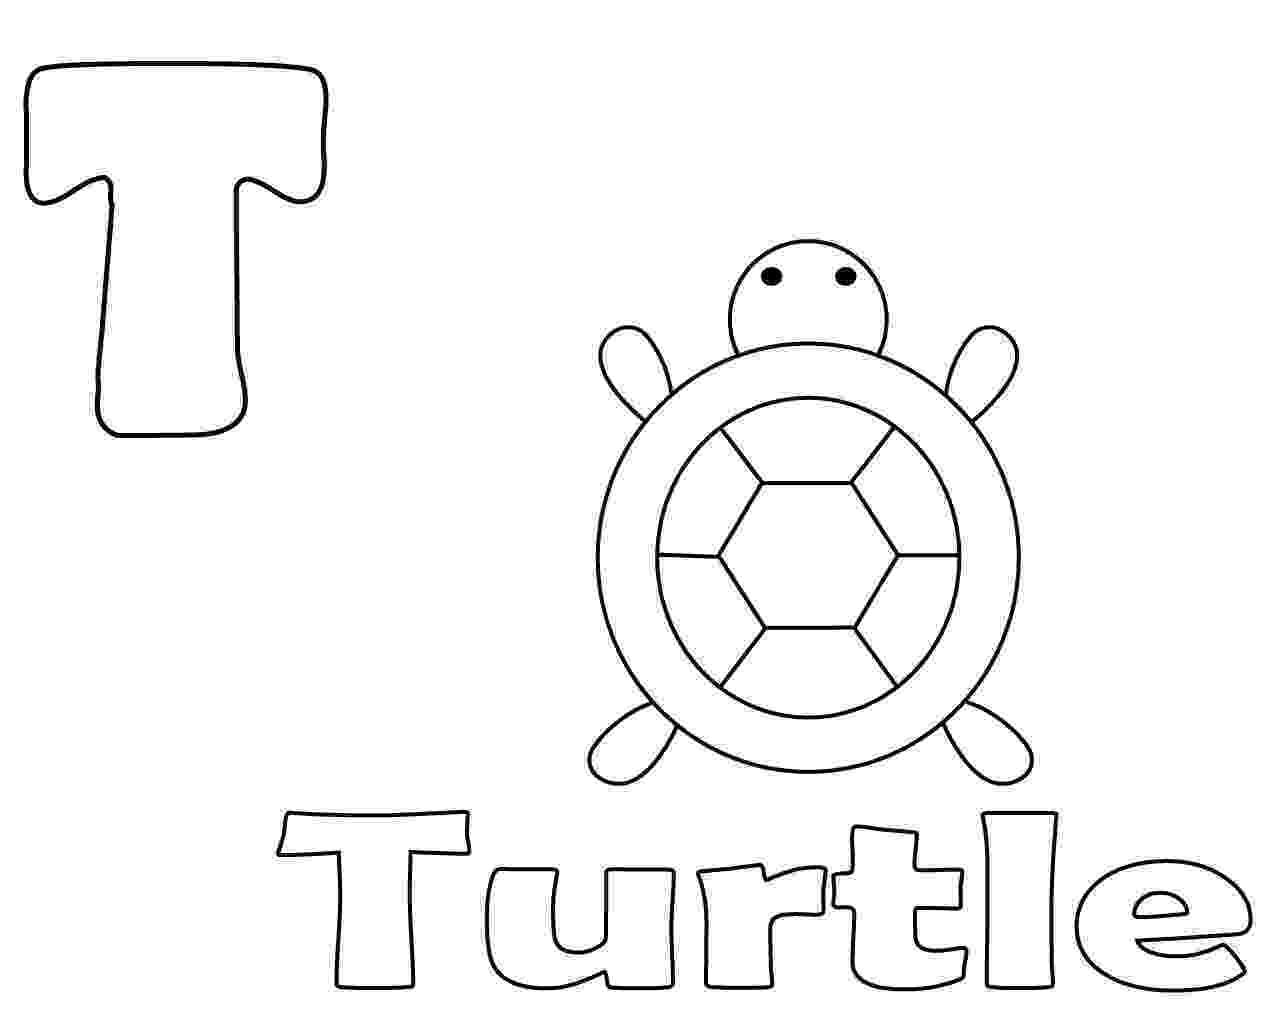 letter t animal coloring pages letter t coloring pages getcoloringpagescom animal pages coloring letter t